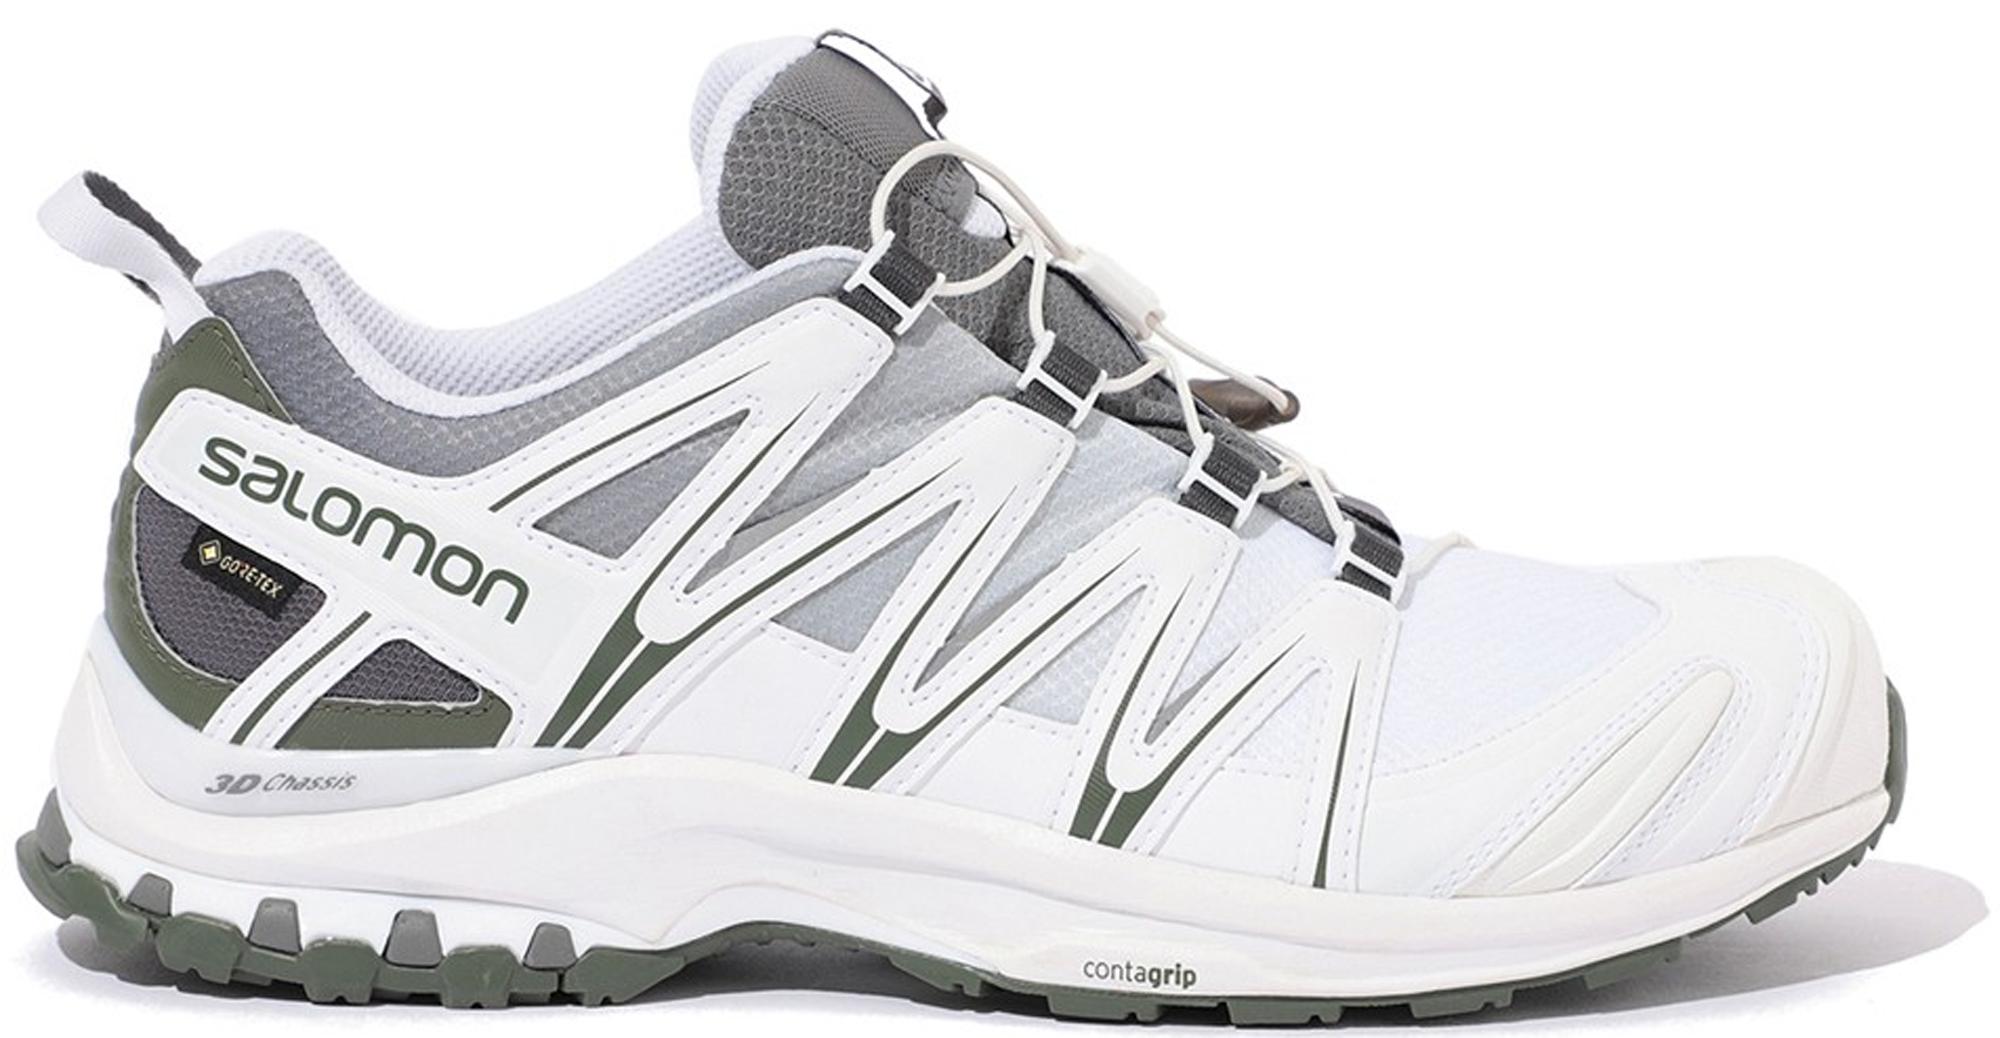 Salomon XA Pro 3D Gtx Beams - Sneakers